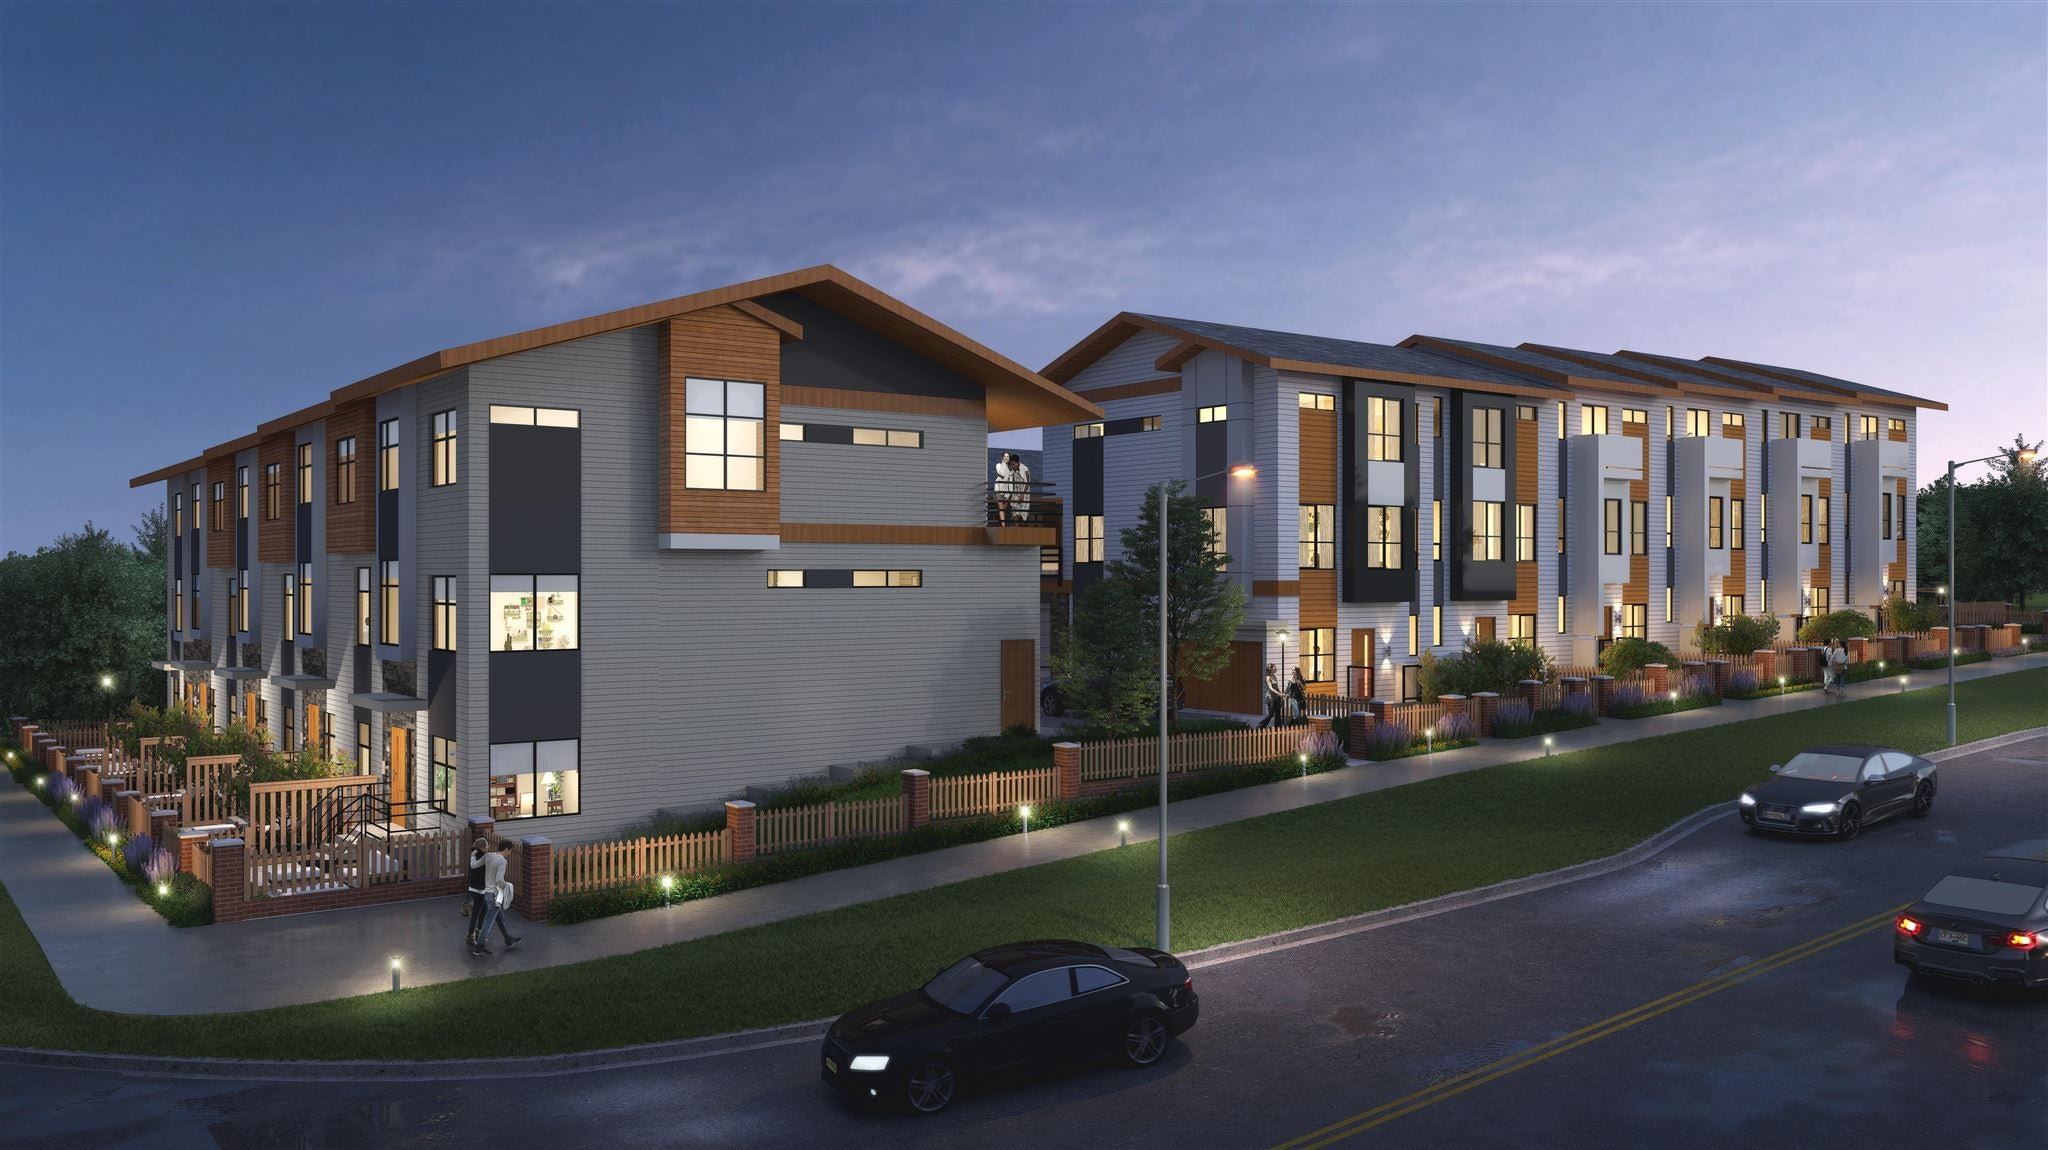 7 5960 142 STREET - Sullivan Station Townhouse for sale, 4 Bedrooms (R2606111) - #1